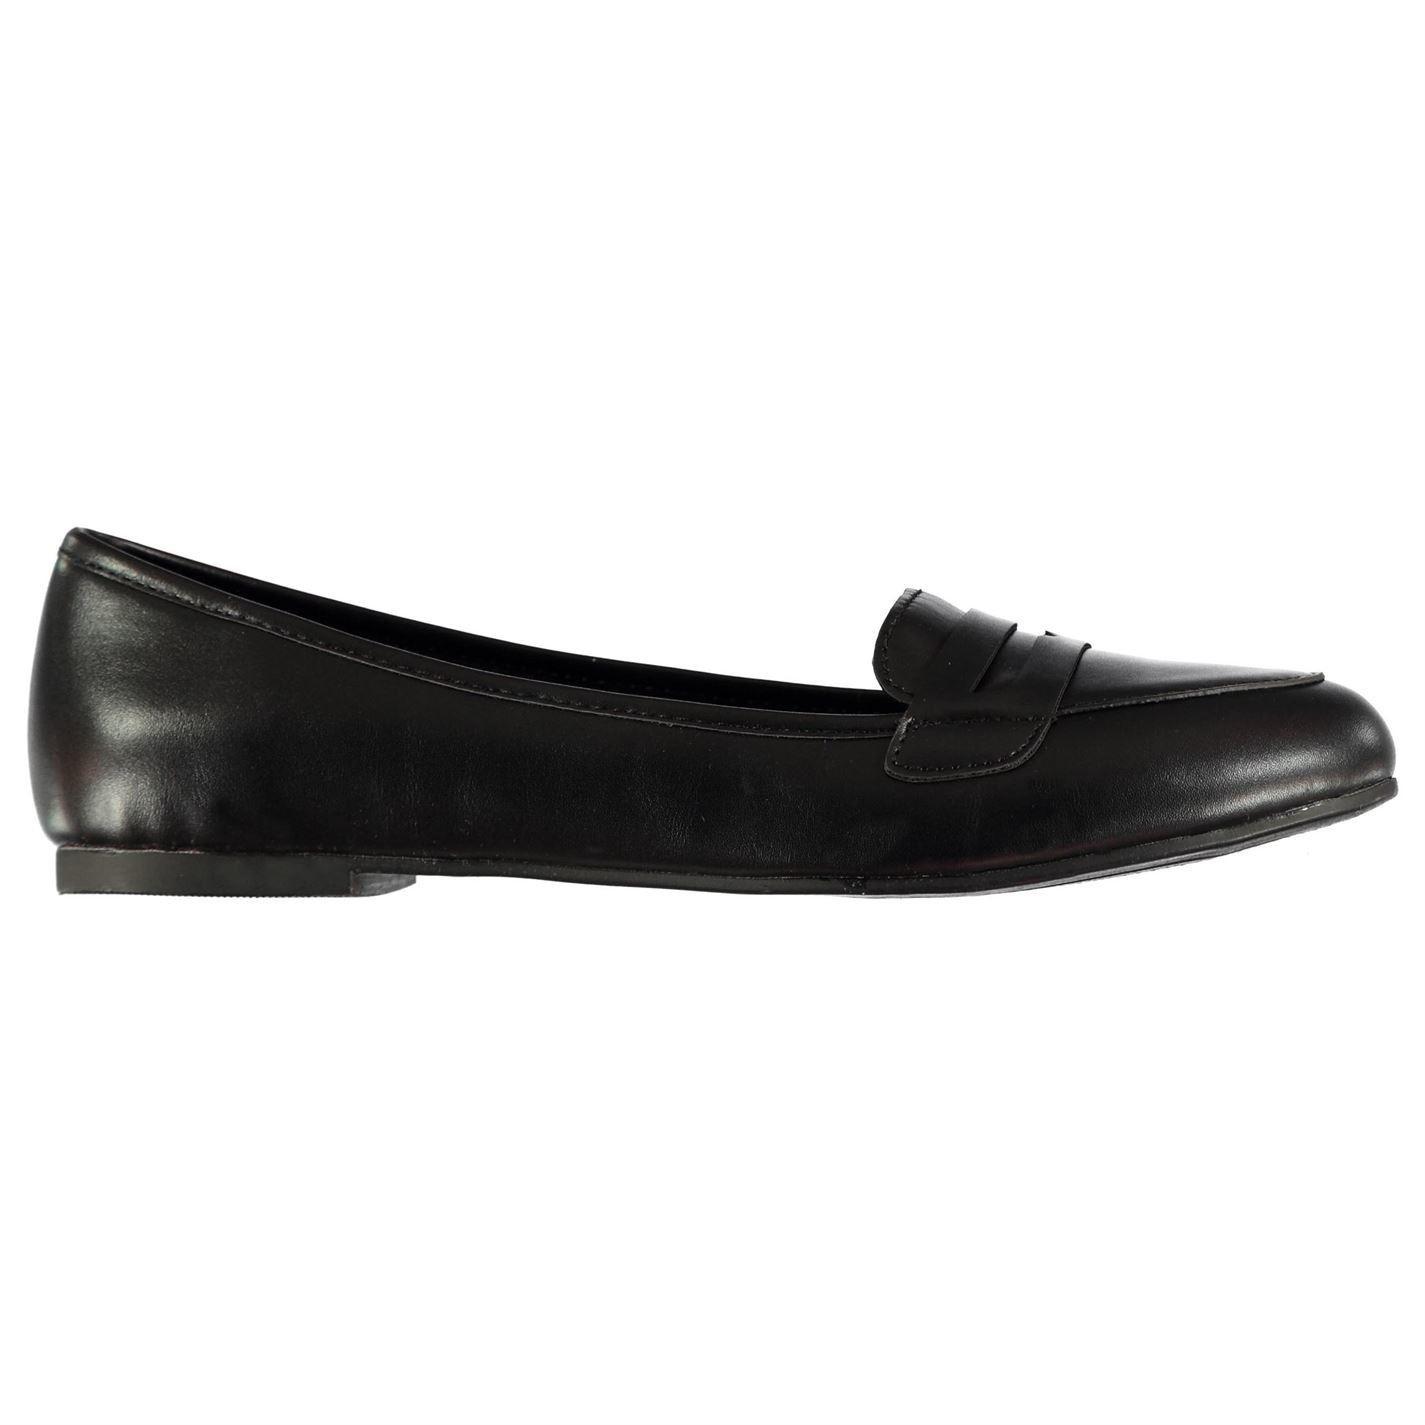 Miso Tina Ladies Flat Shoes Black